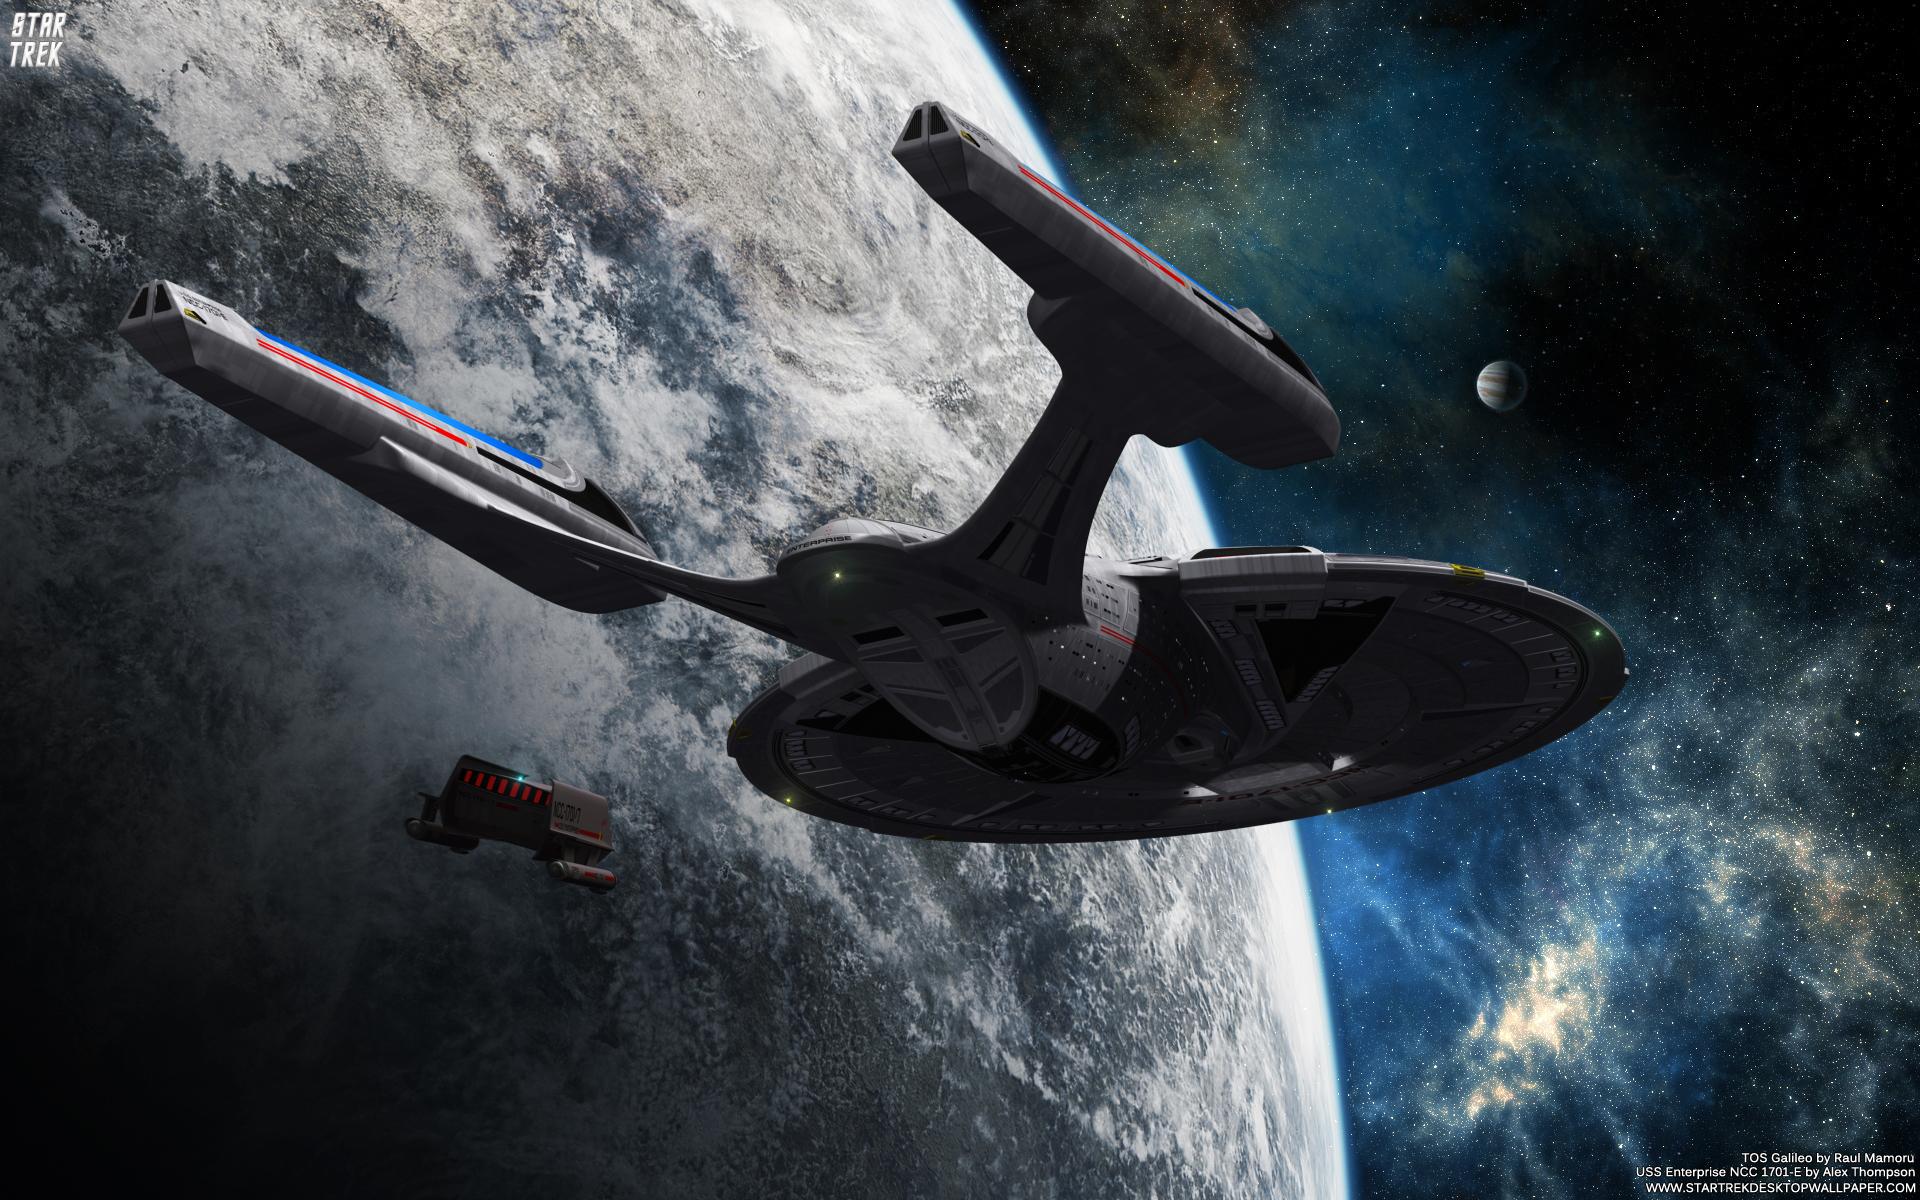 Star Trek Into Darkness Enterprise wallpaper   910788 1920x1200